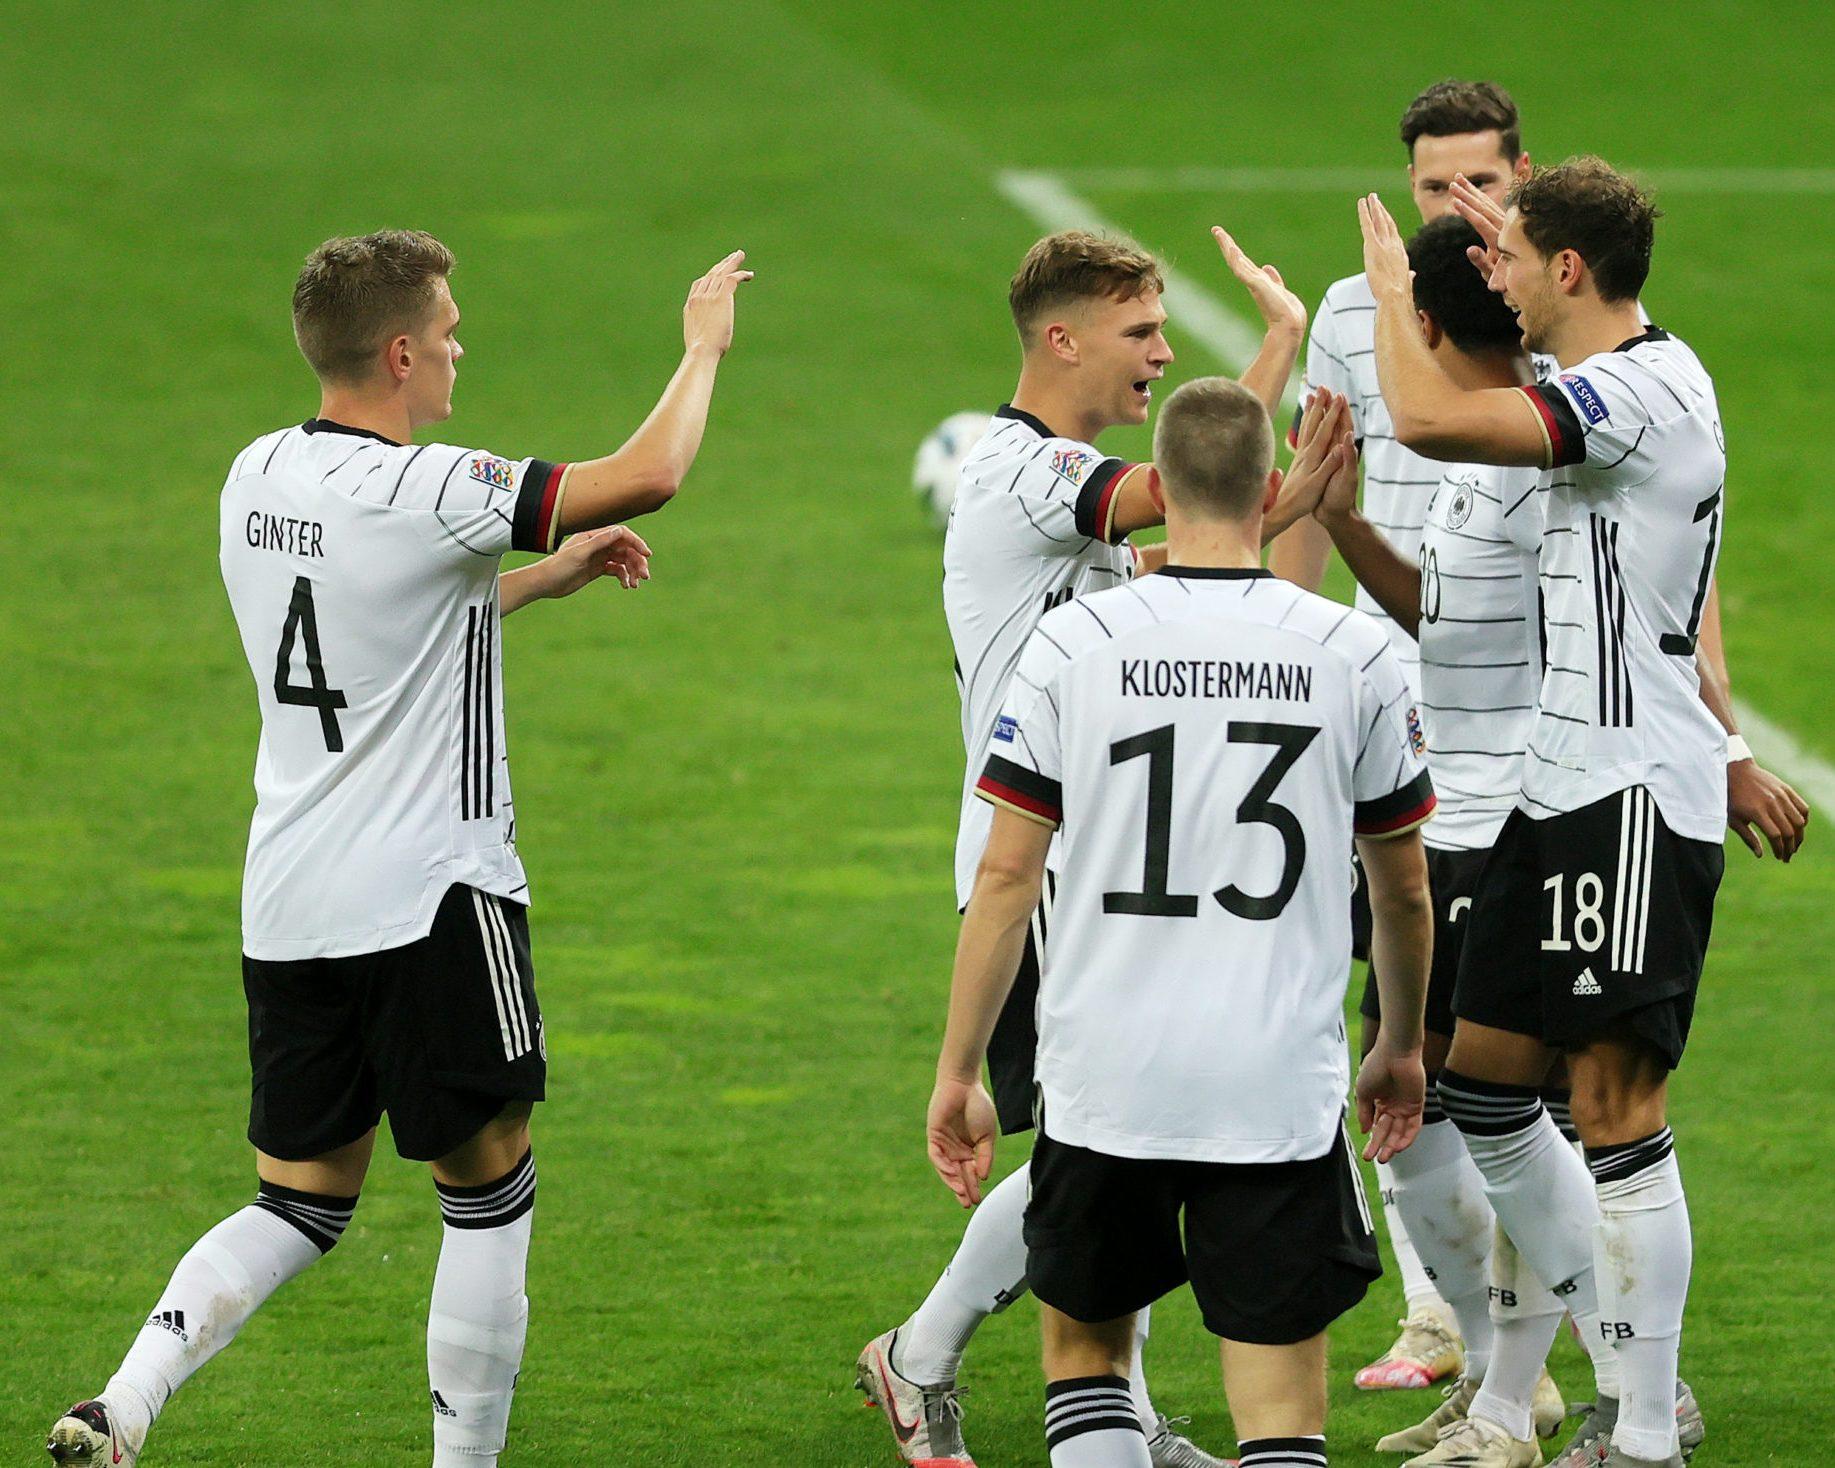 Bundesliga Leon Goretzka And Matthias Ginter Fire Germany To Victory In Ukraine